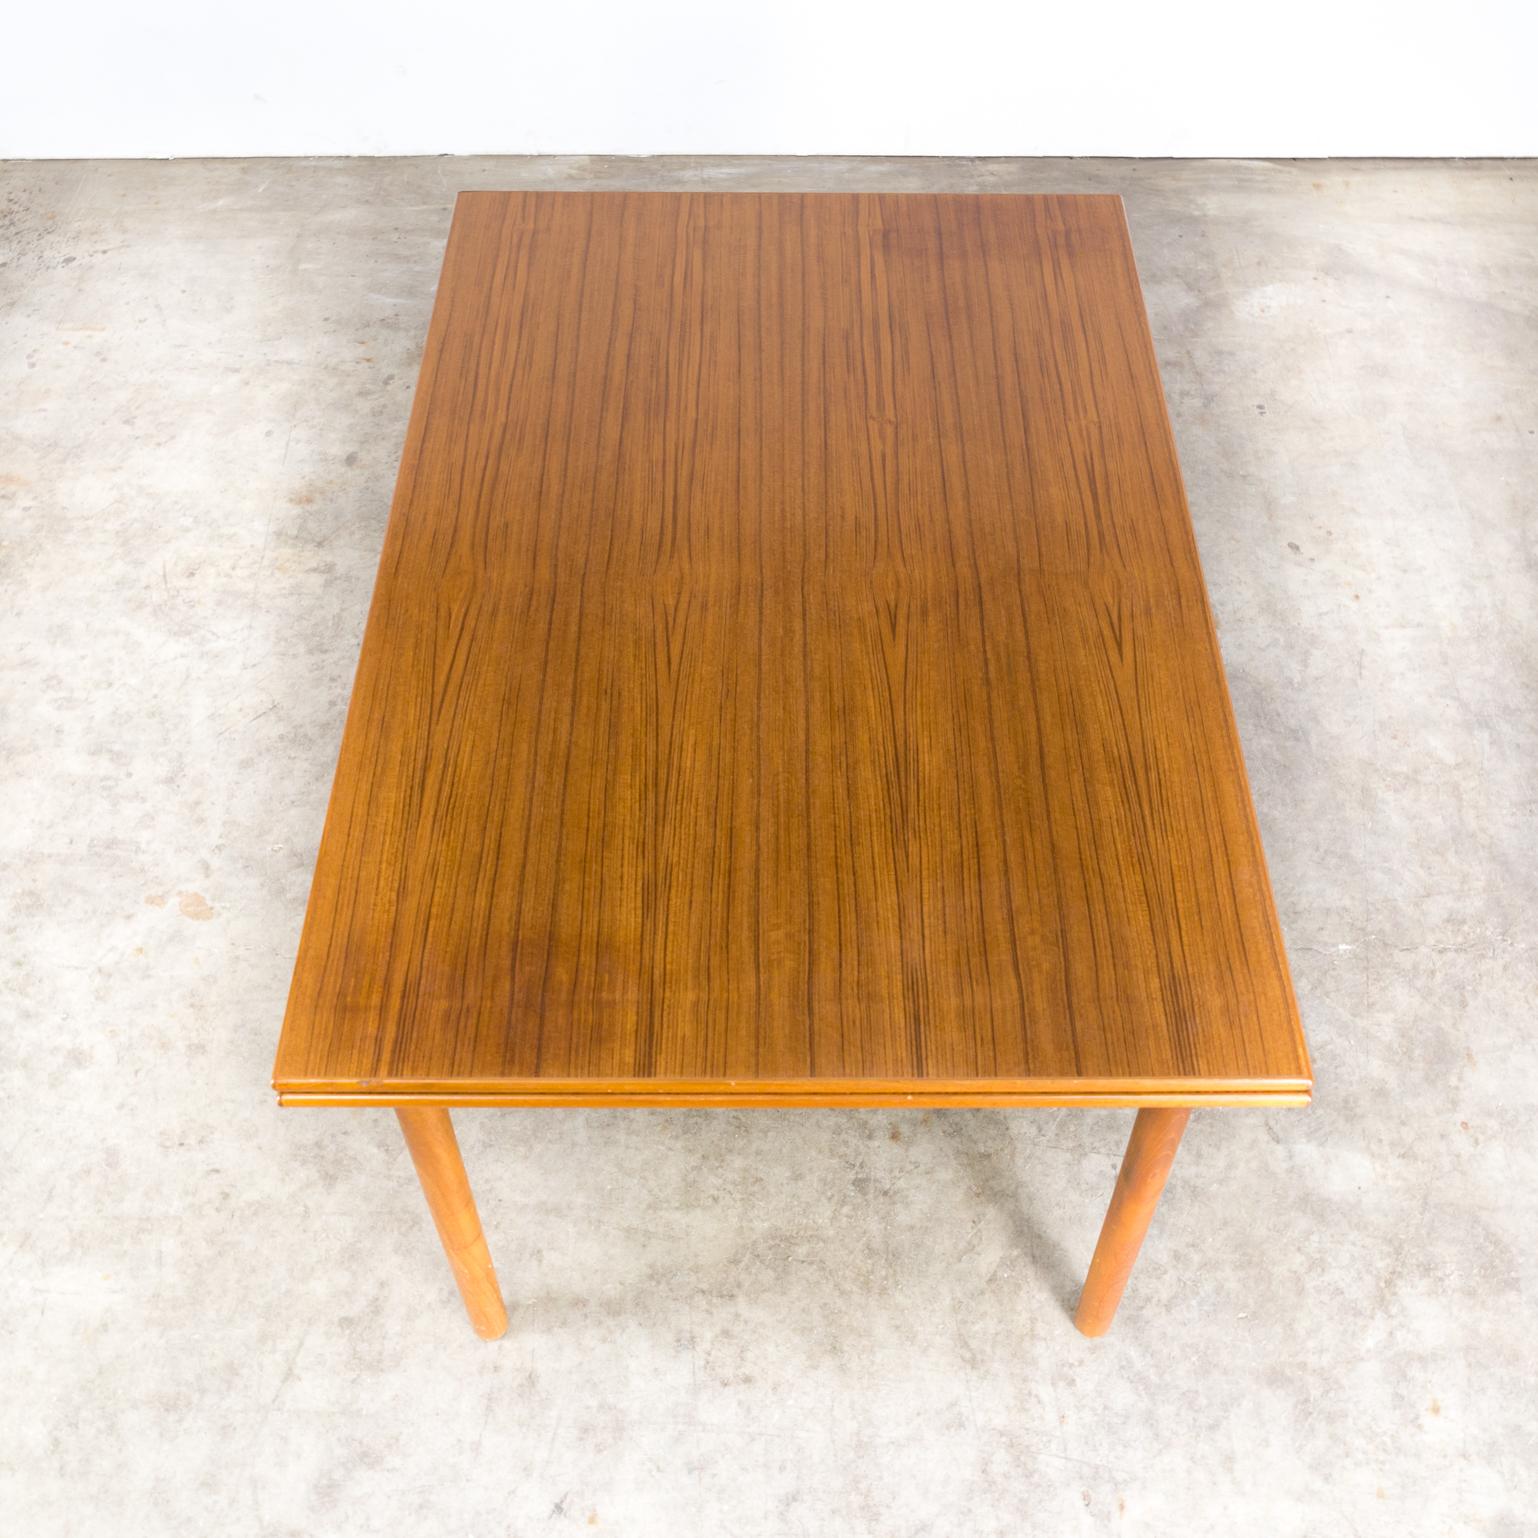 Teak Extendable Coffee Table: 60s Teak Extendable Dining Table